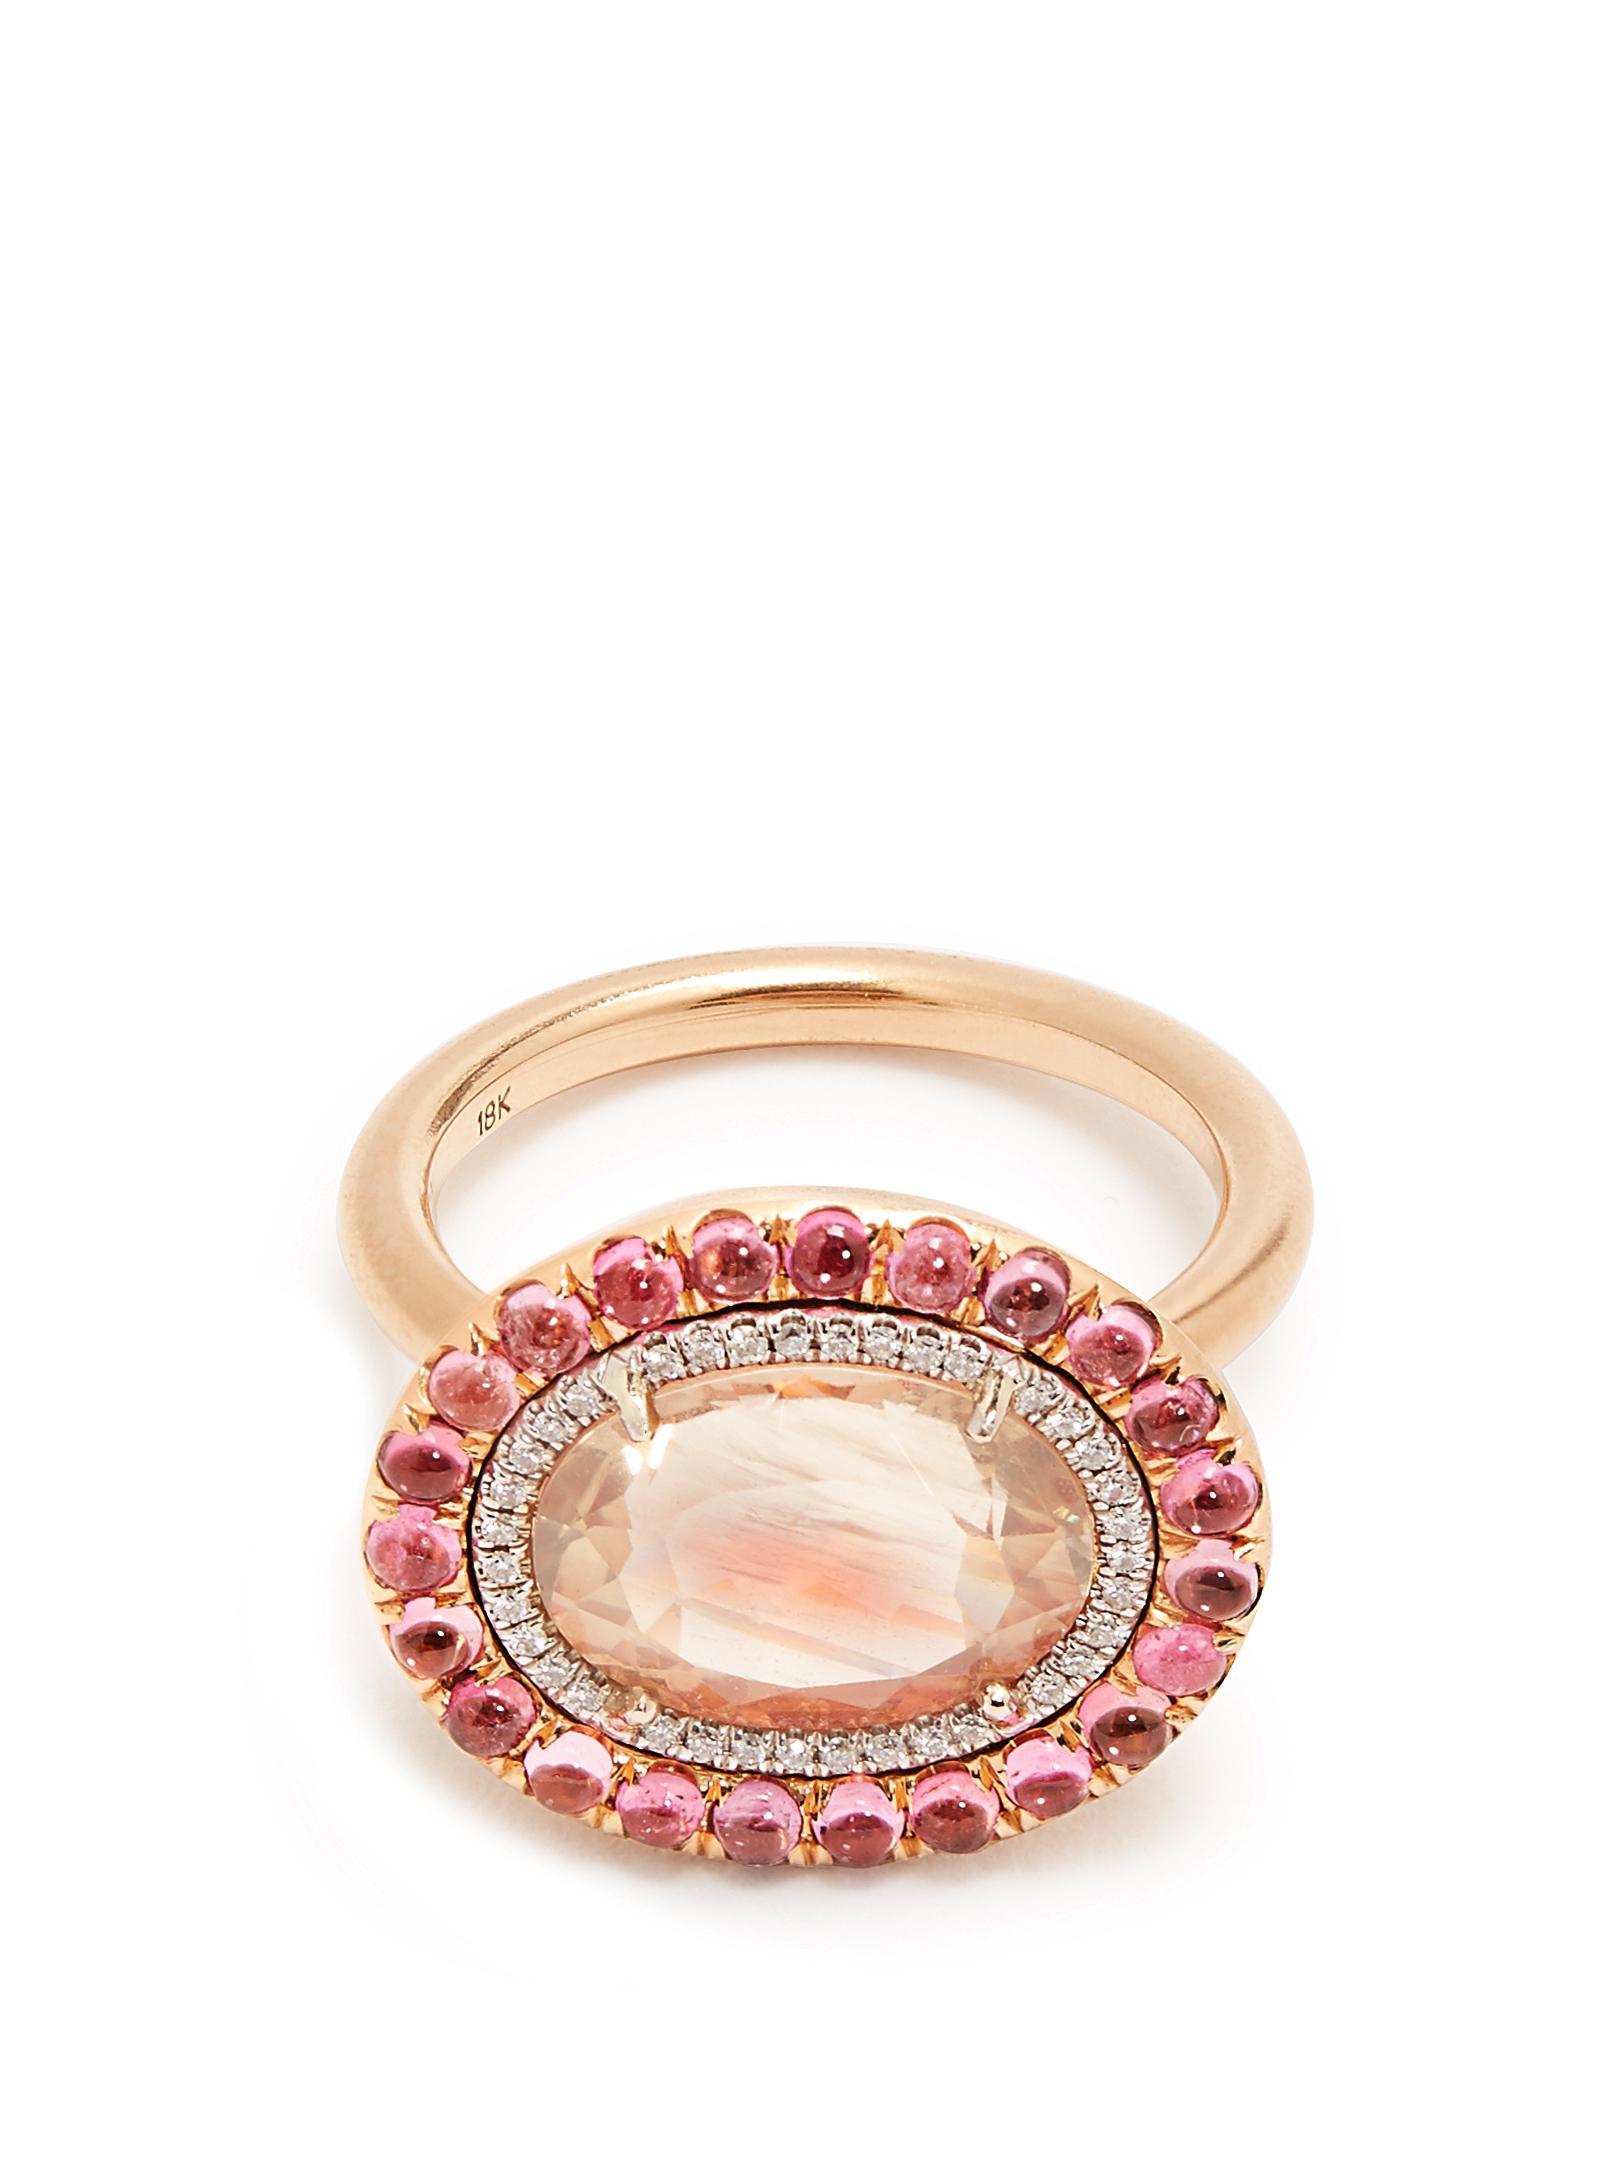 18kt gold and tourmaline ring Irene Neuwirth GGrl463R